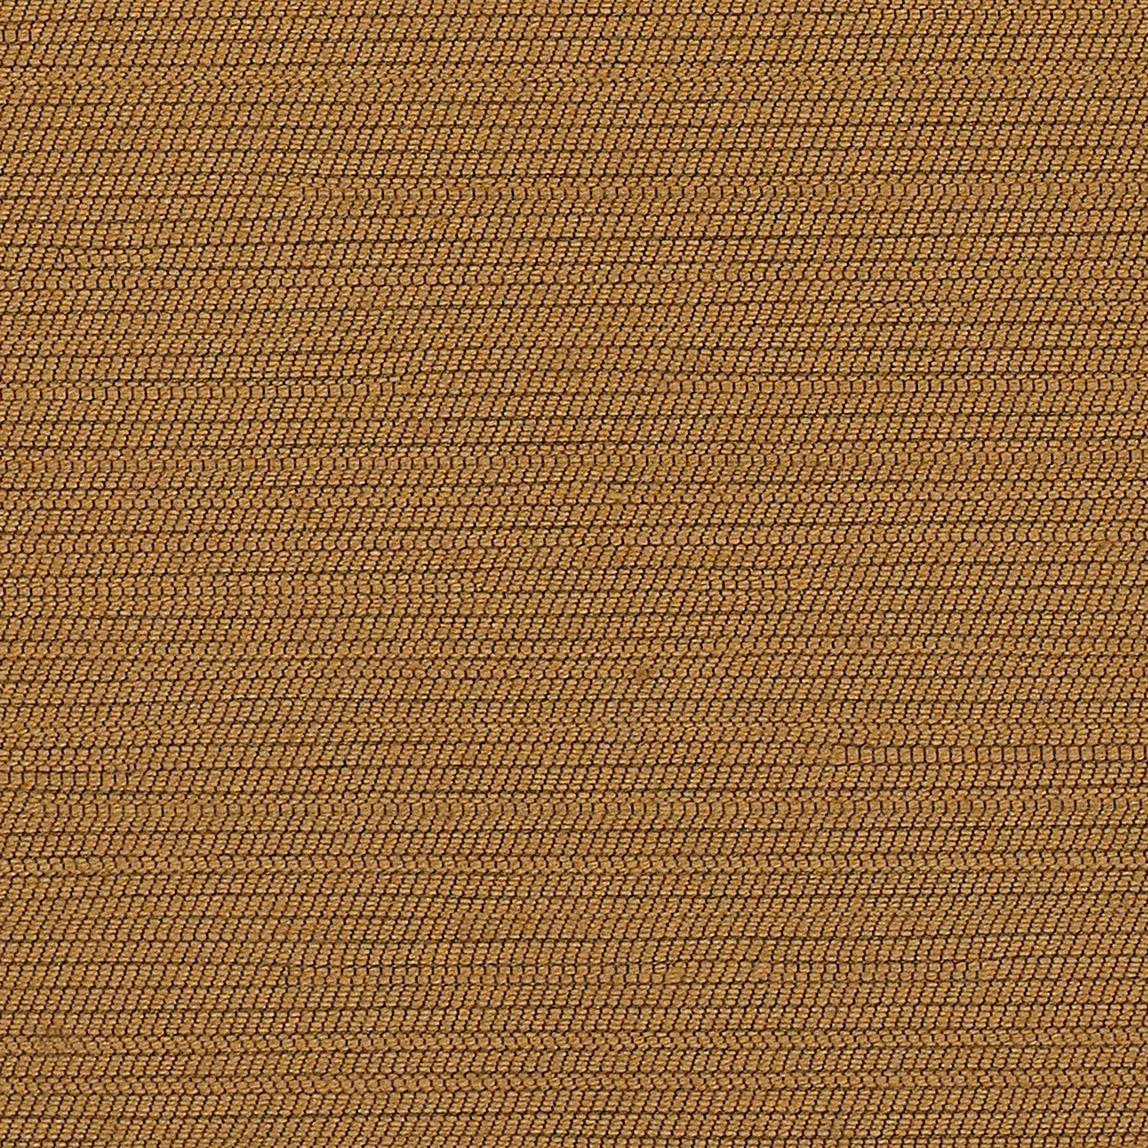 Weaving Palettes Pecan Swatch